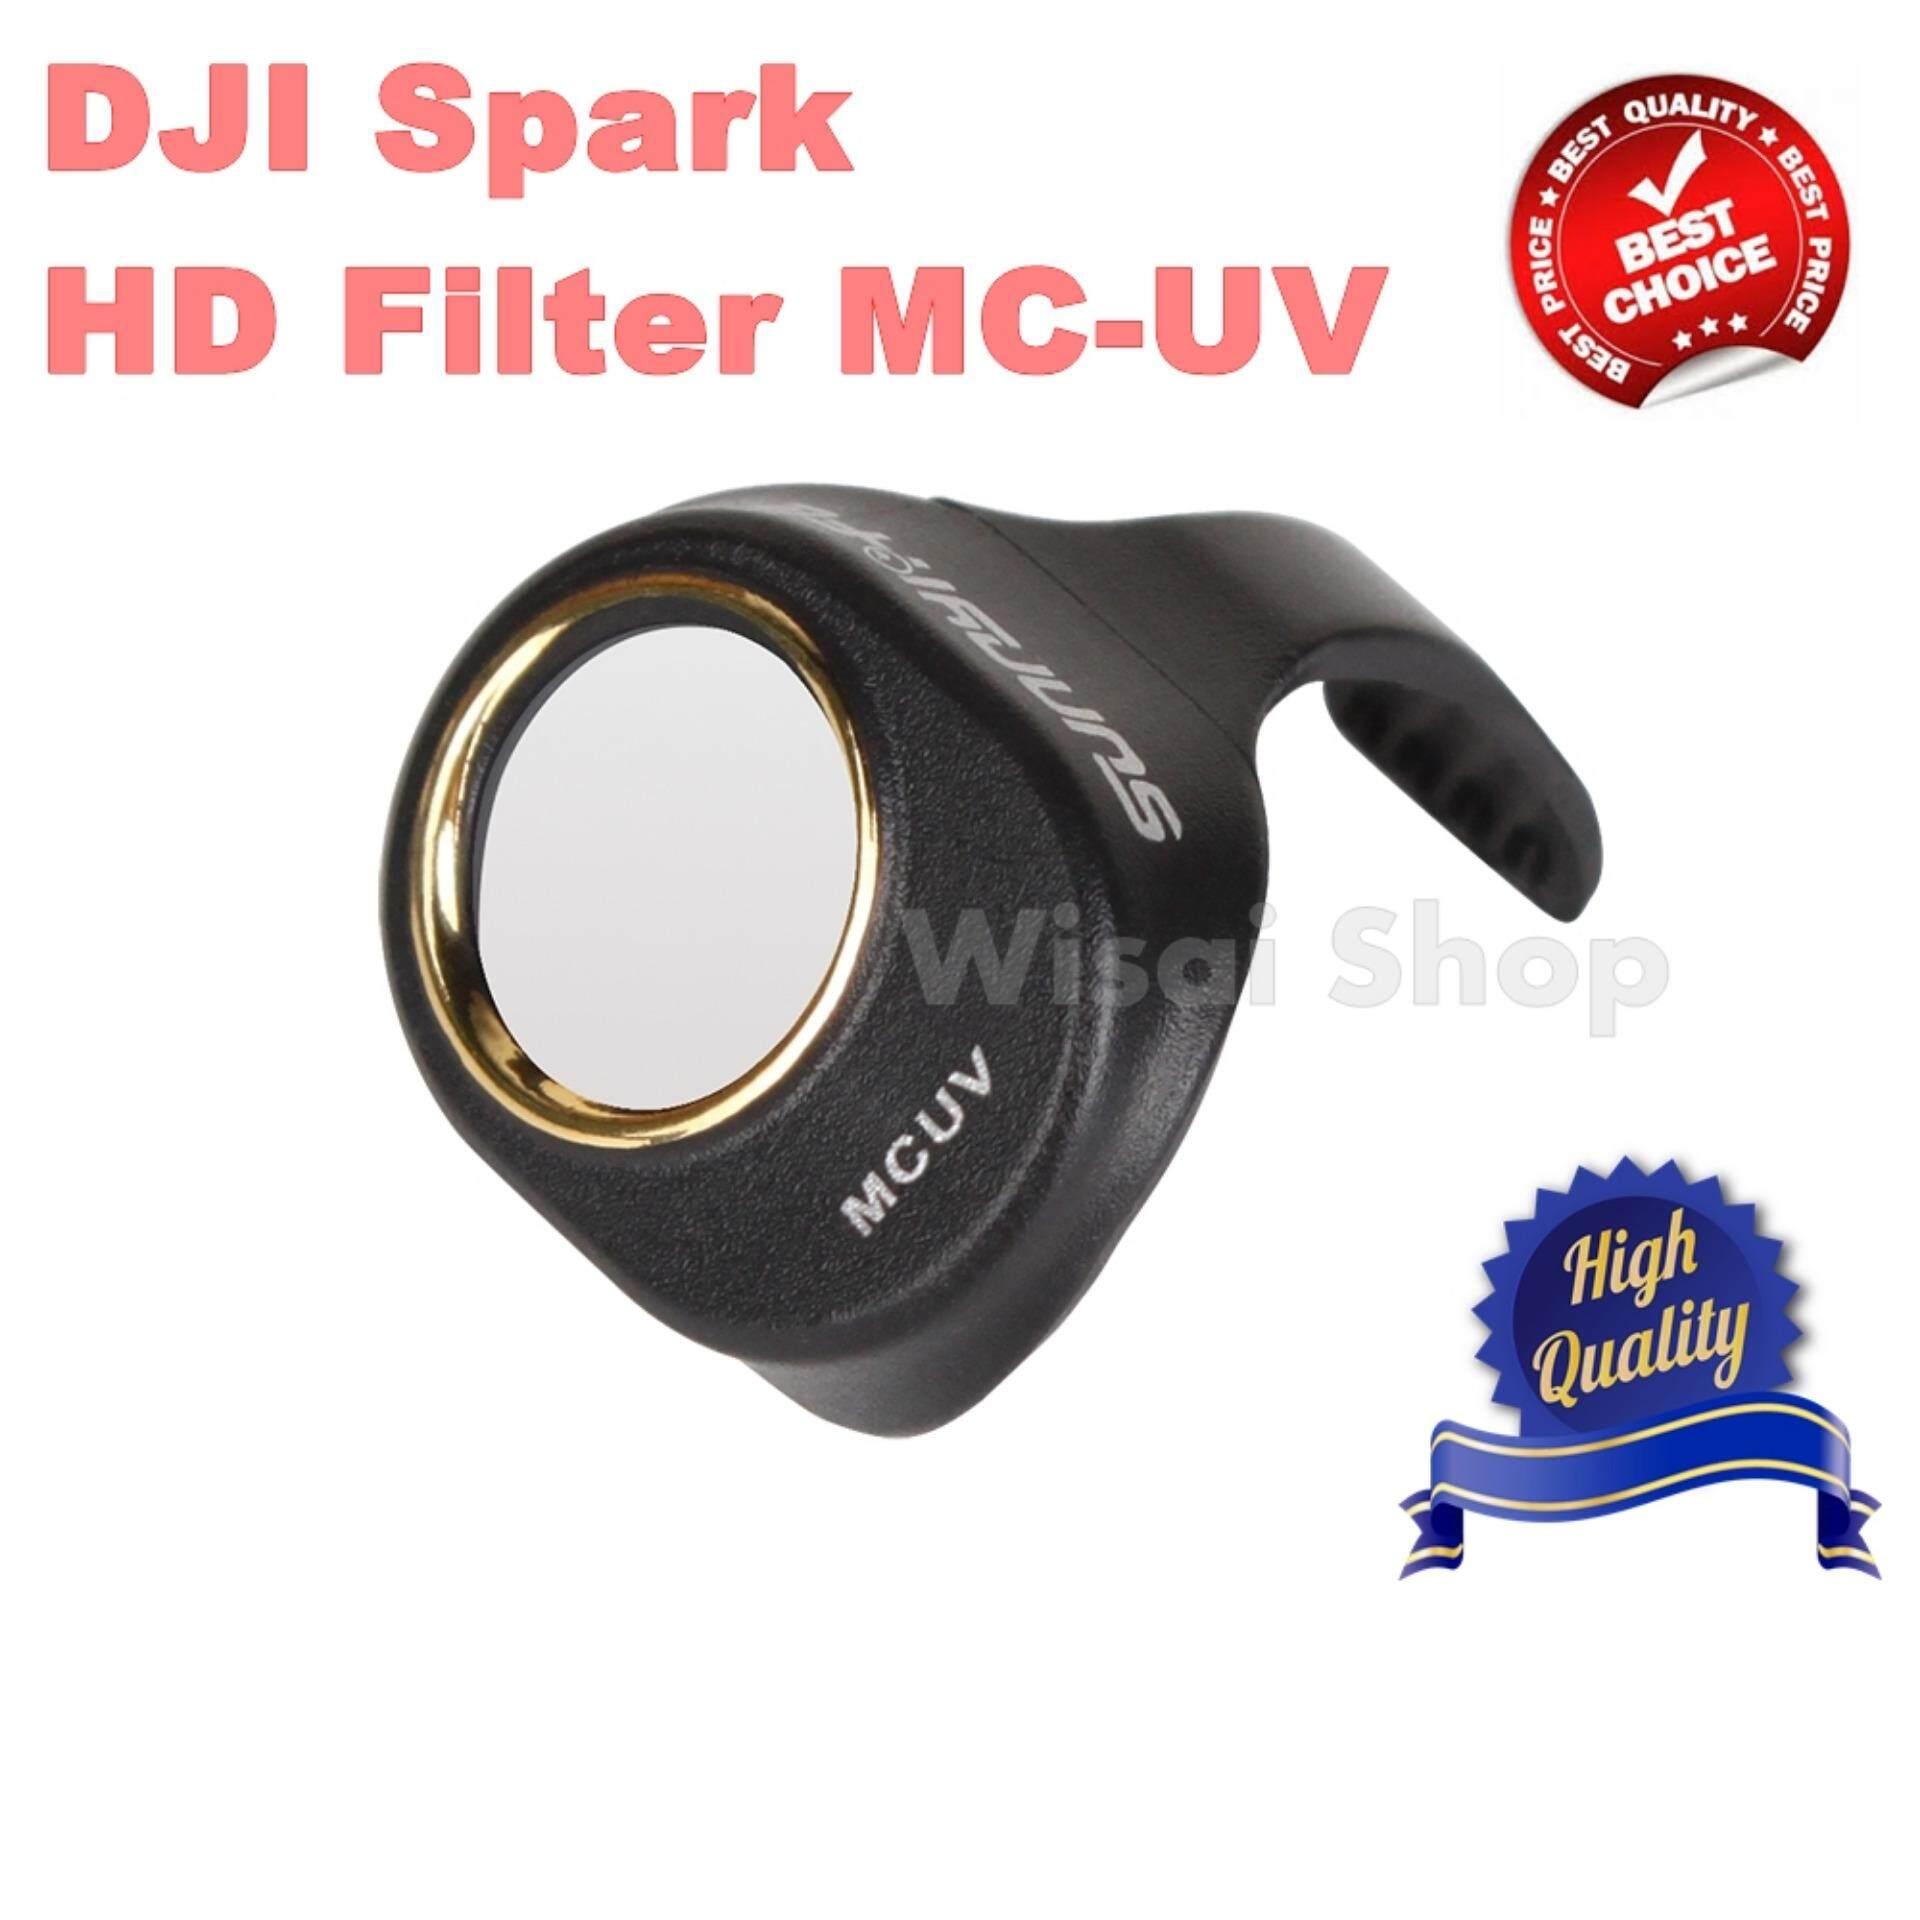 Sunnylife ฟิลเตอร์ MC-UV สำหรับ DJI Spark